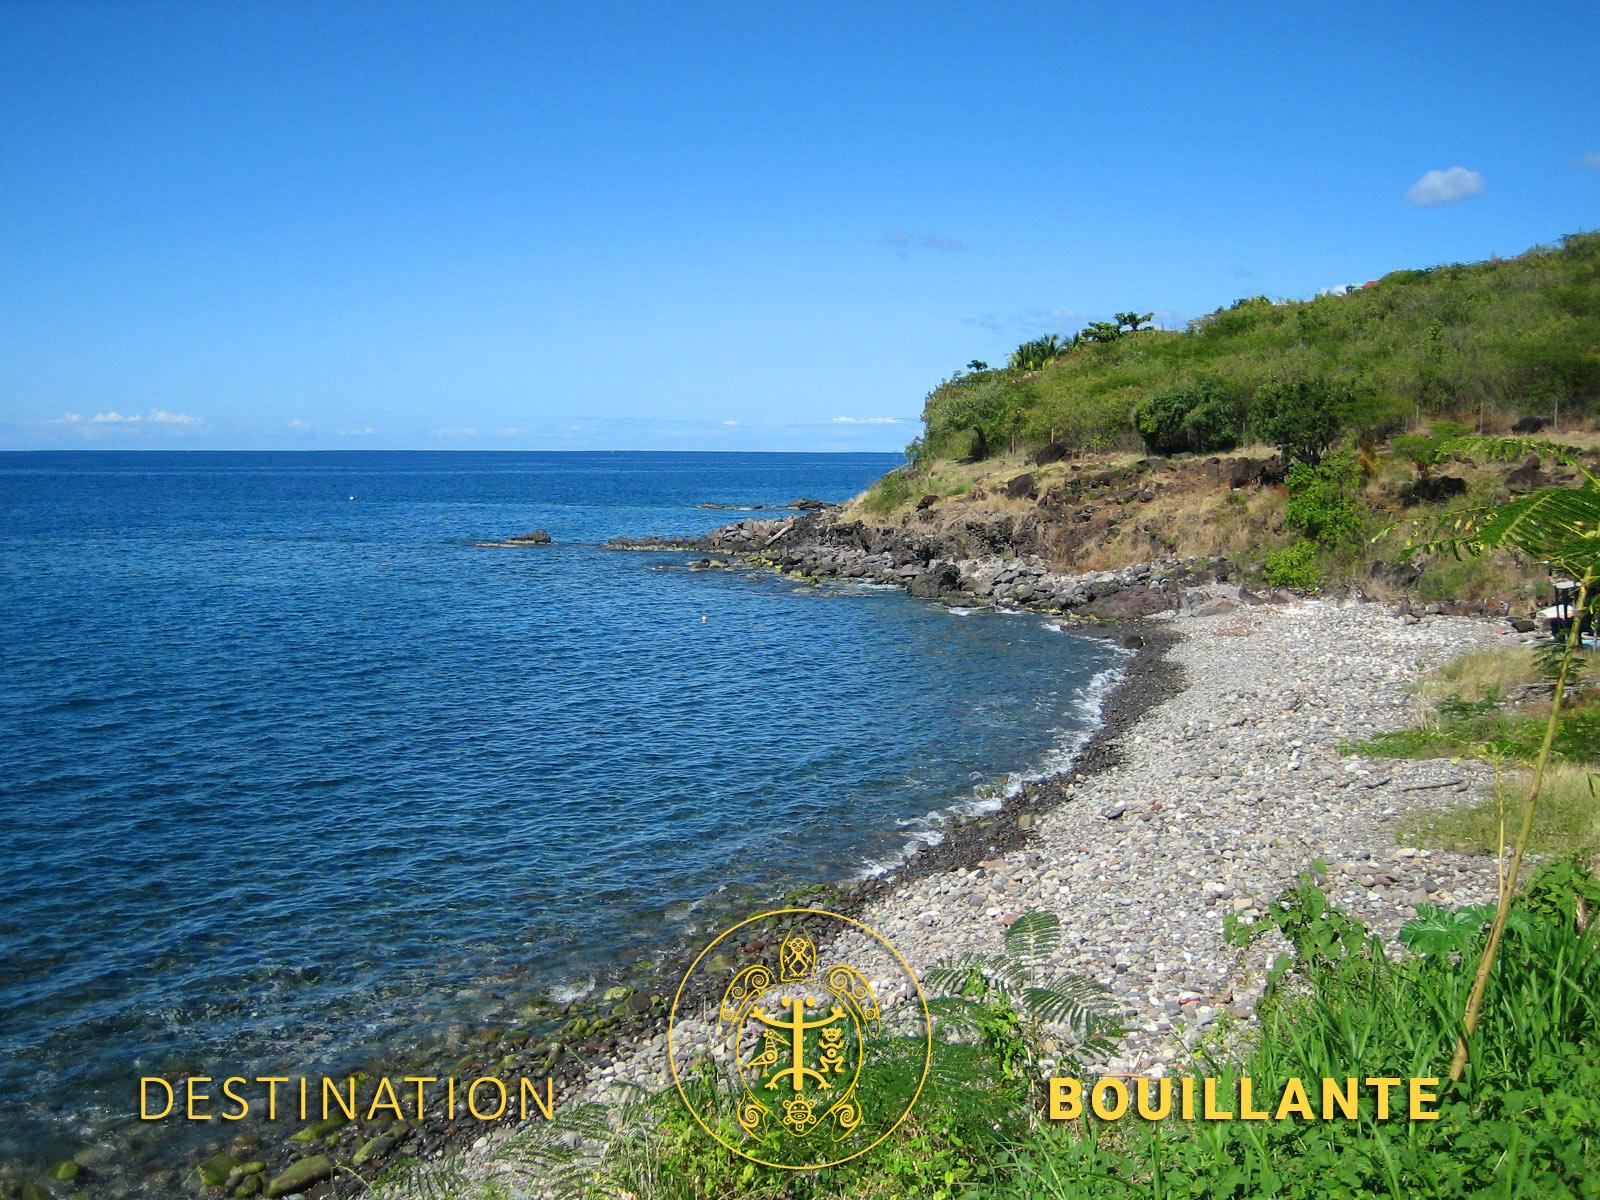 Plage de l'Anse Thomas - Bouillante